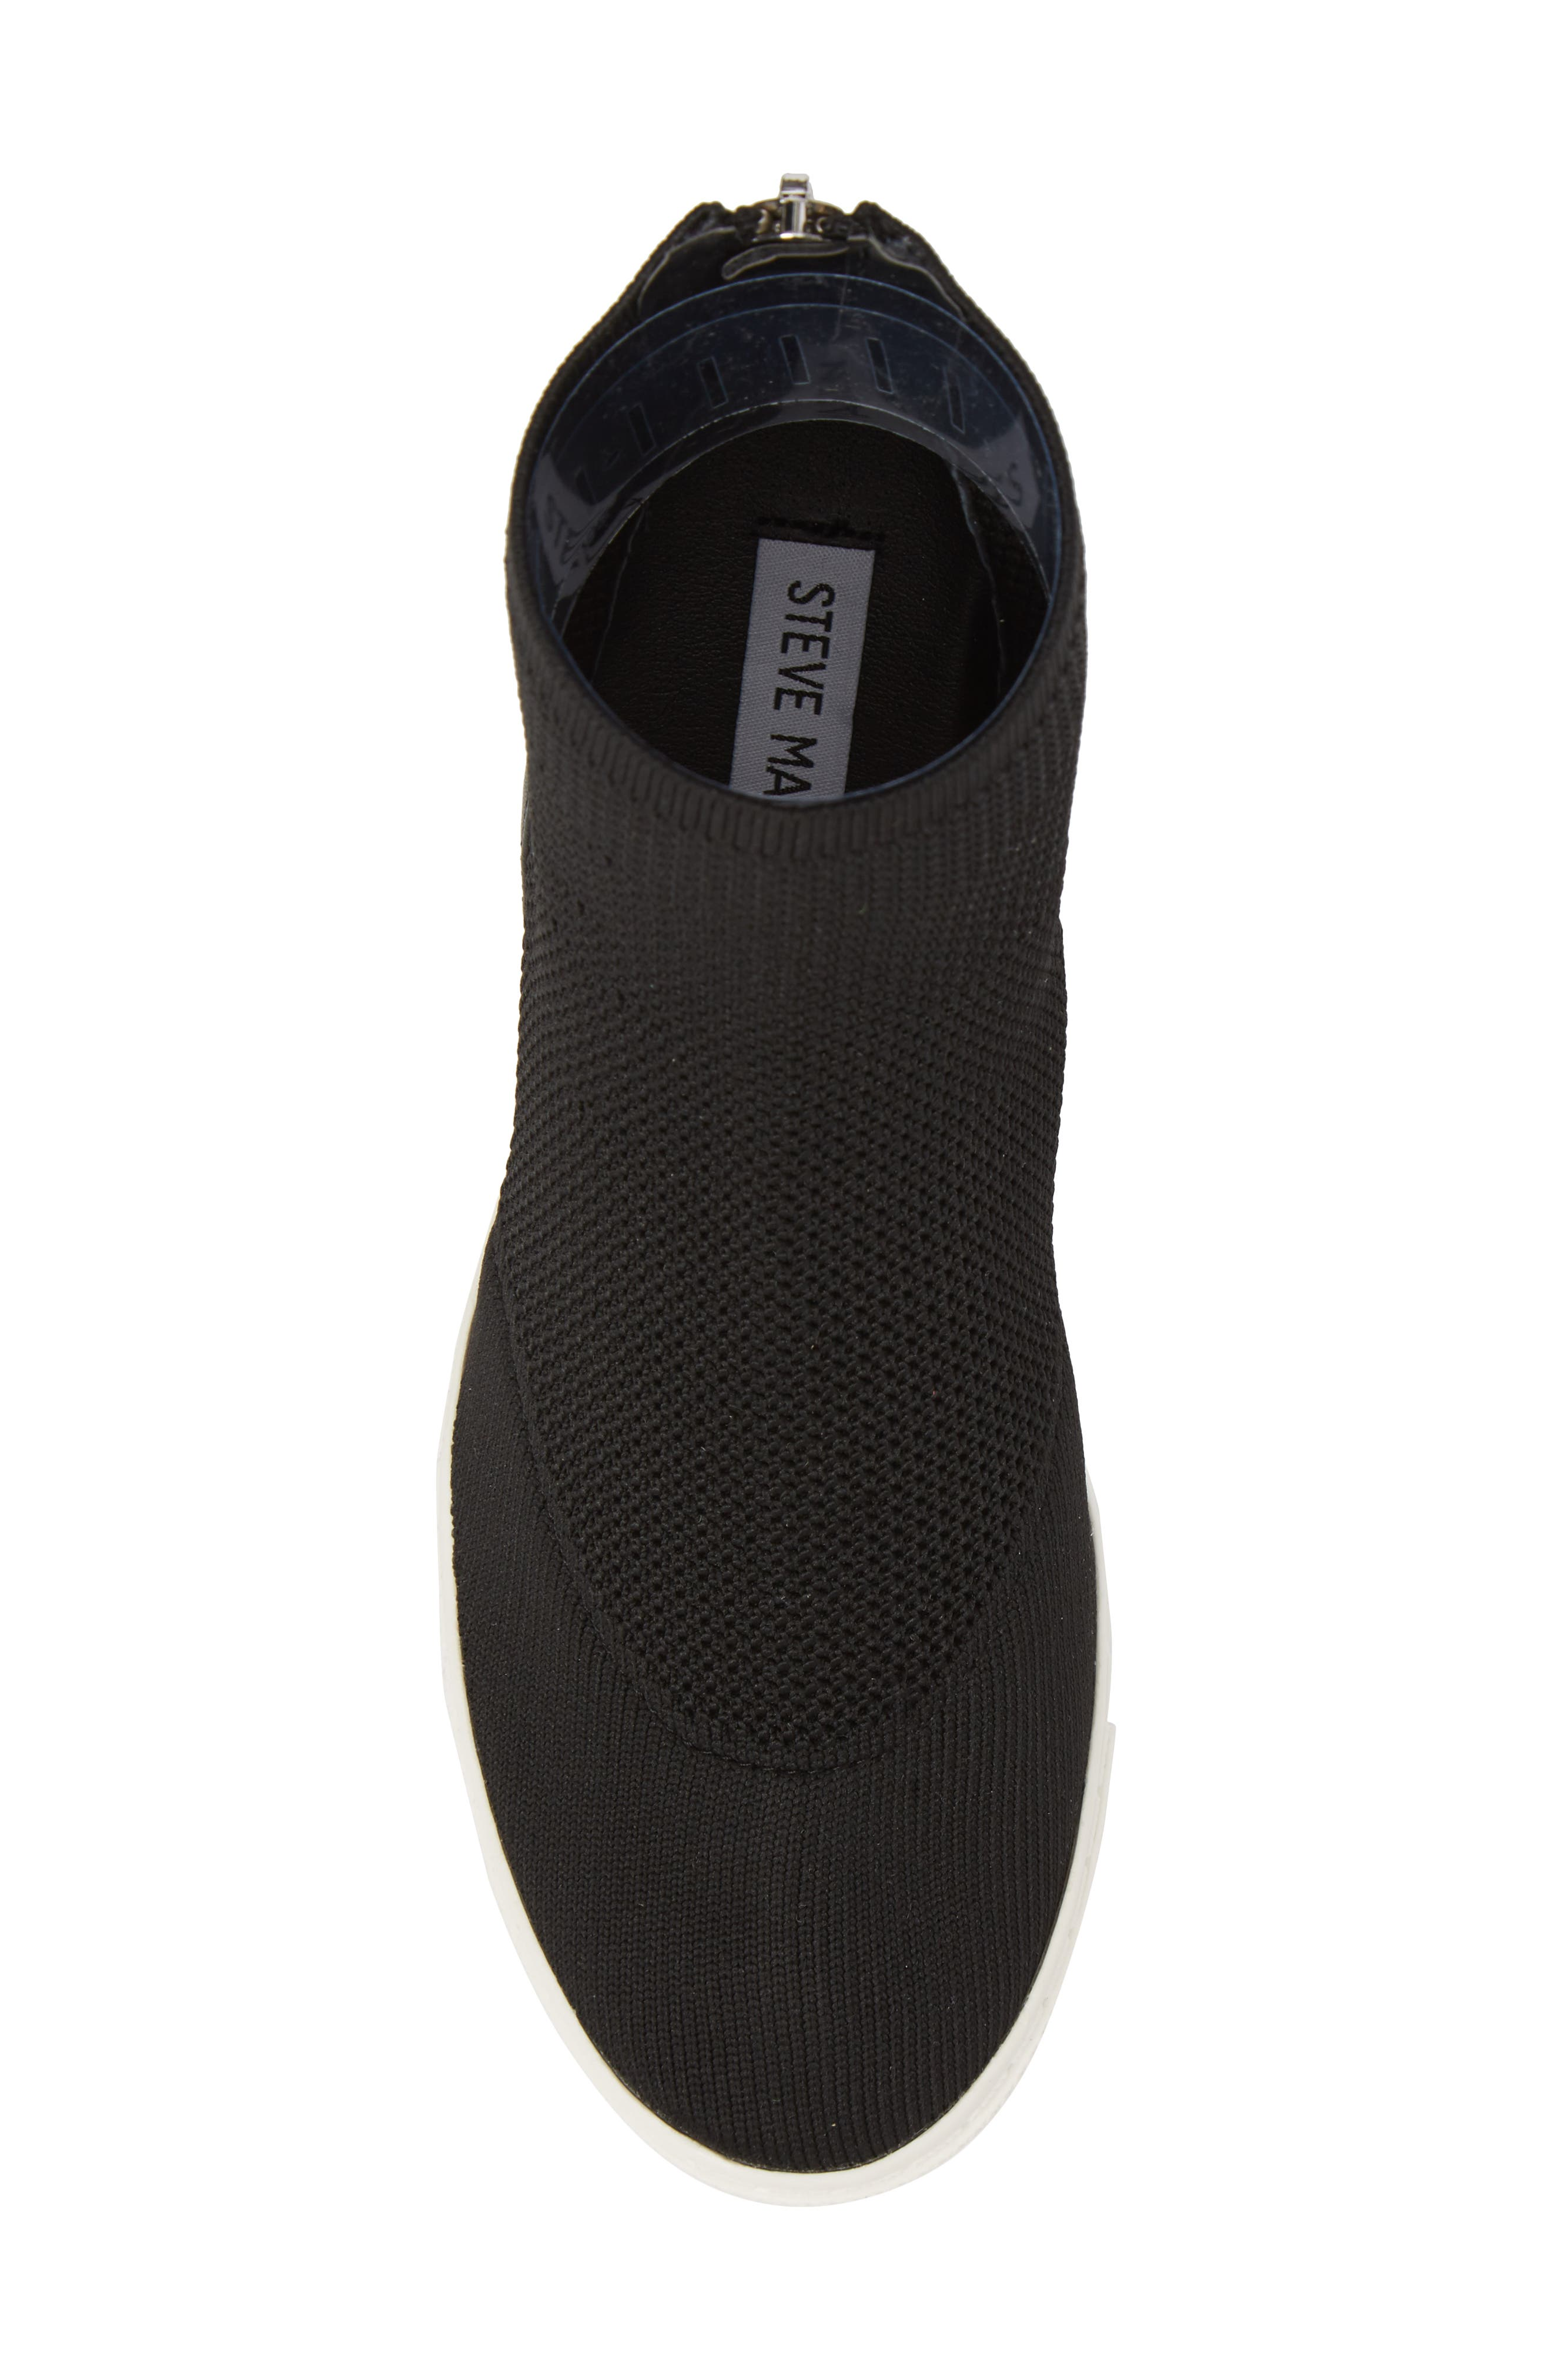 Lizzy Sneaker Bootie,                             Alternate thumbnail 5, color,                             Black